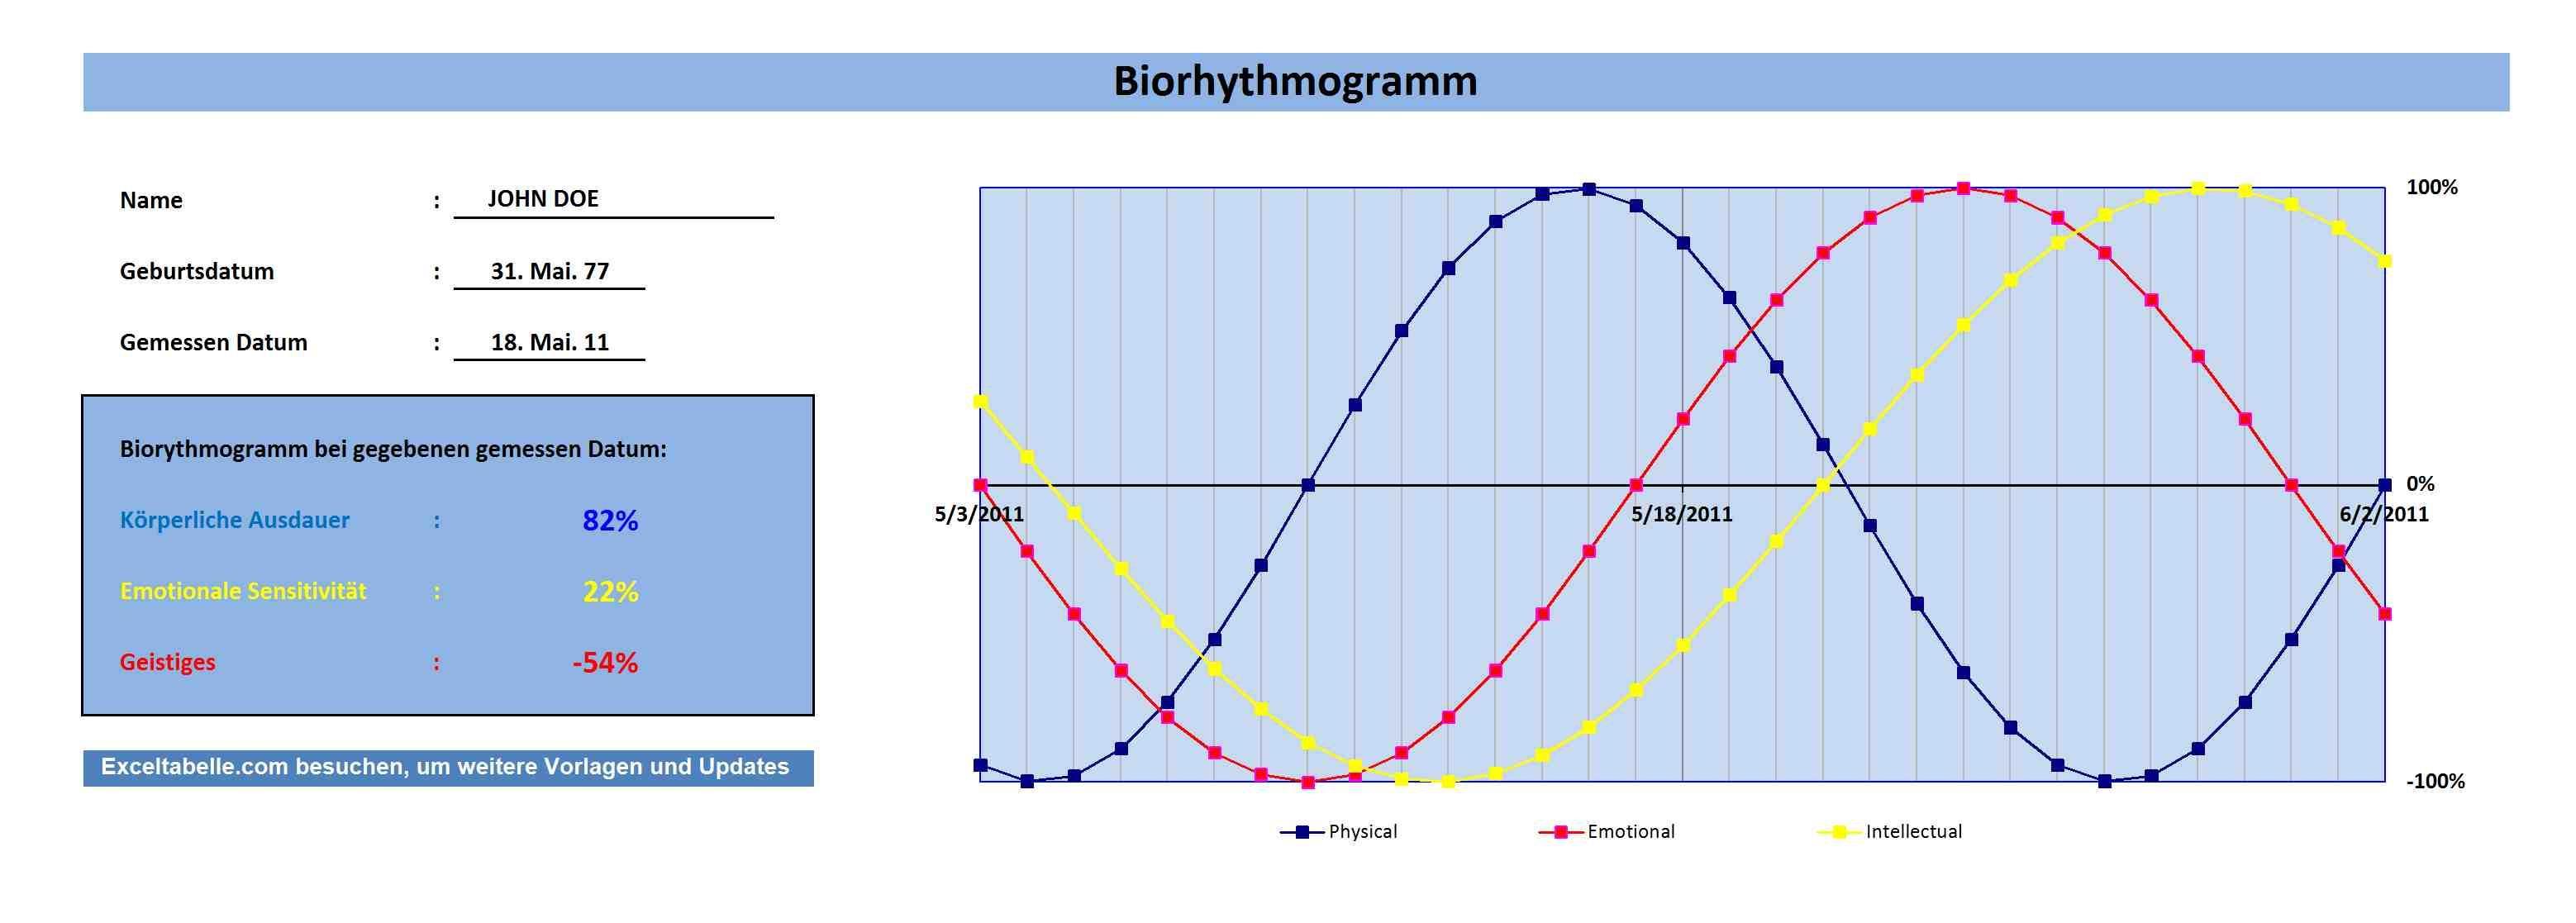 Biorhythmogramm